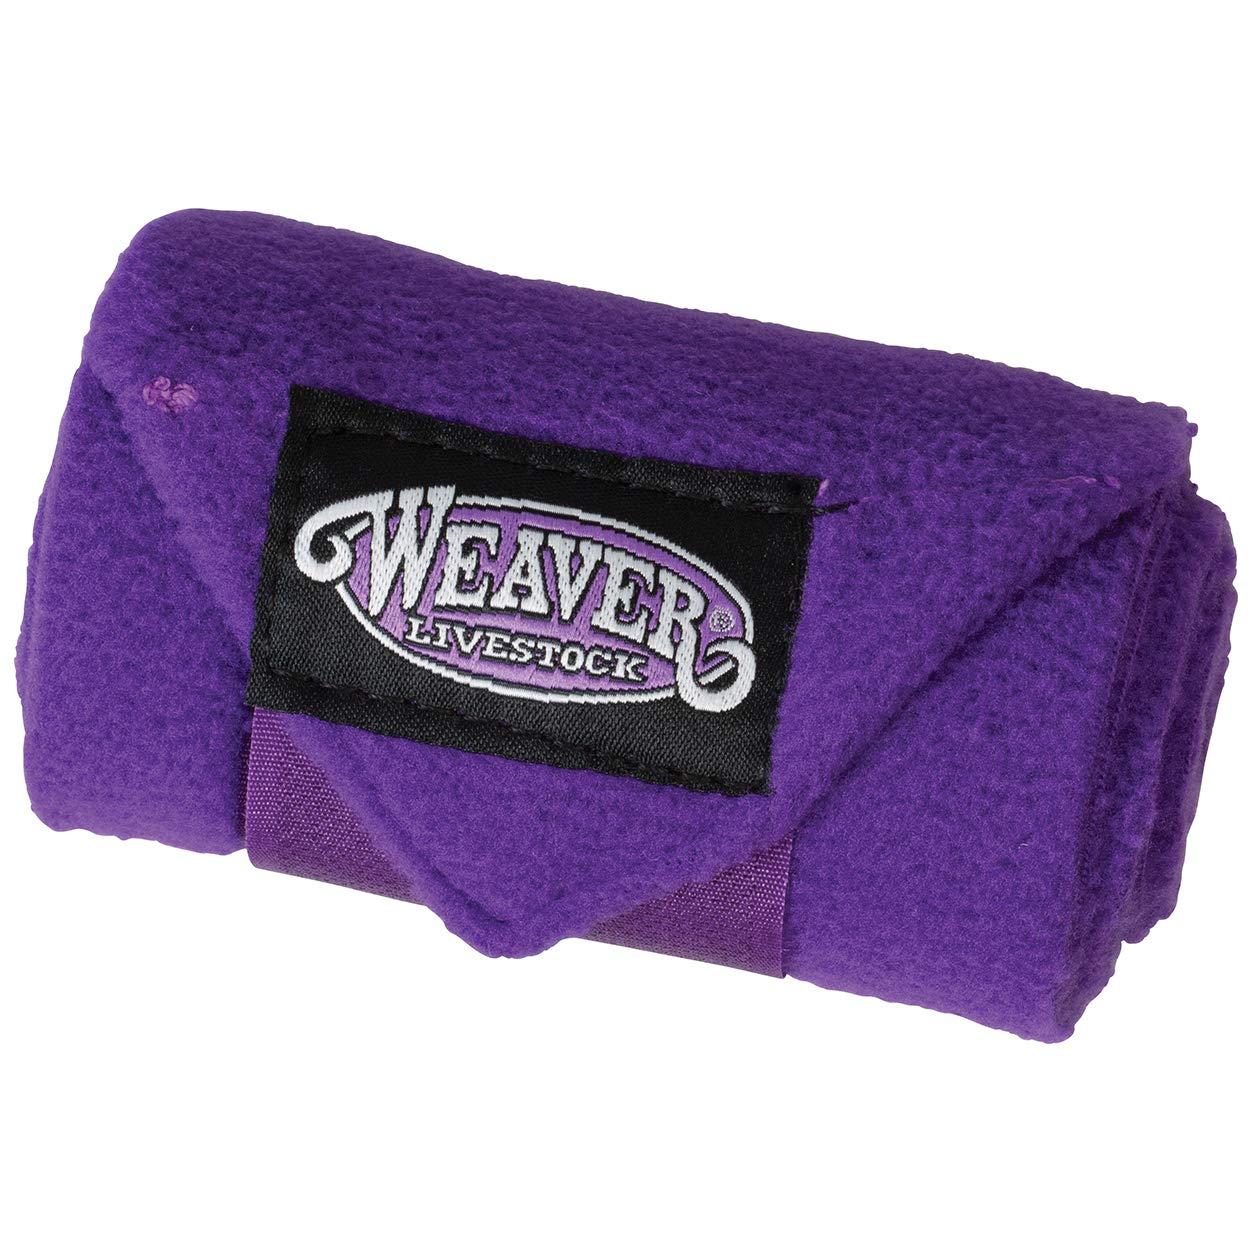 Weaver Leather Sheep & Goat Fleece Leg Wraps, Four-Pack, Purple by Weaver Leather